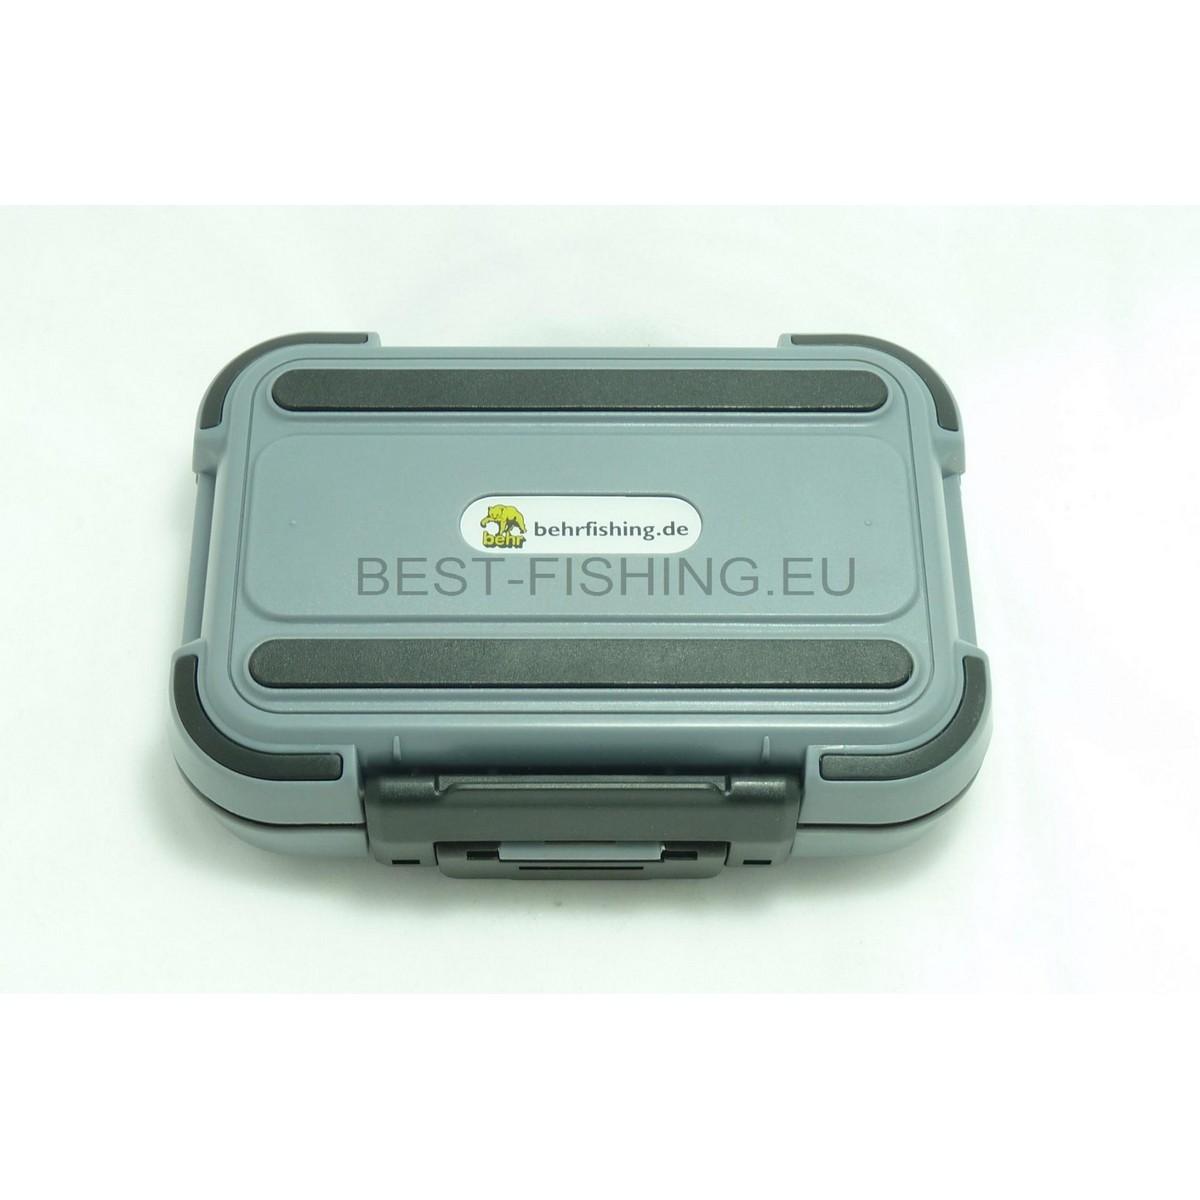 Кутия Behr мухарска 46-205 05